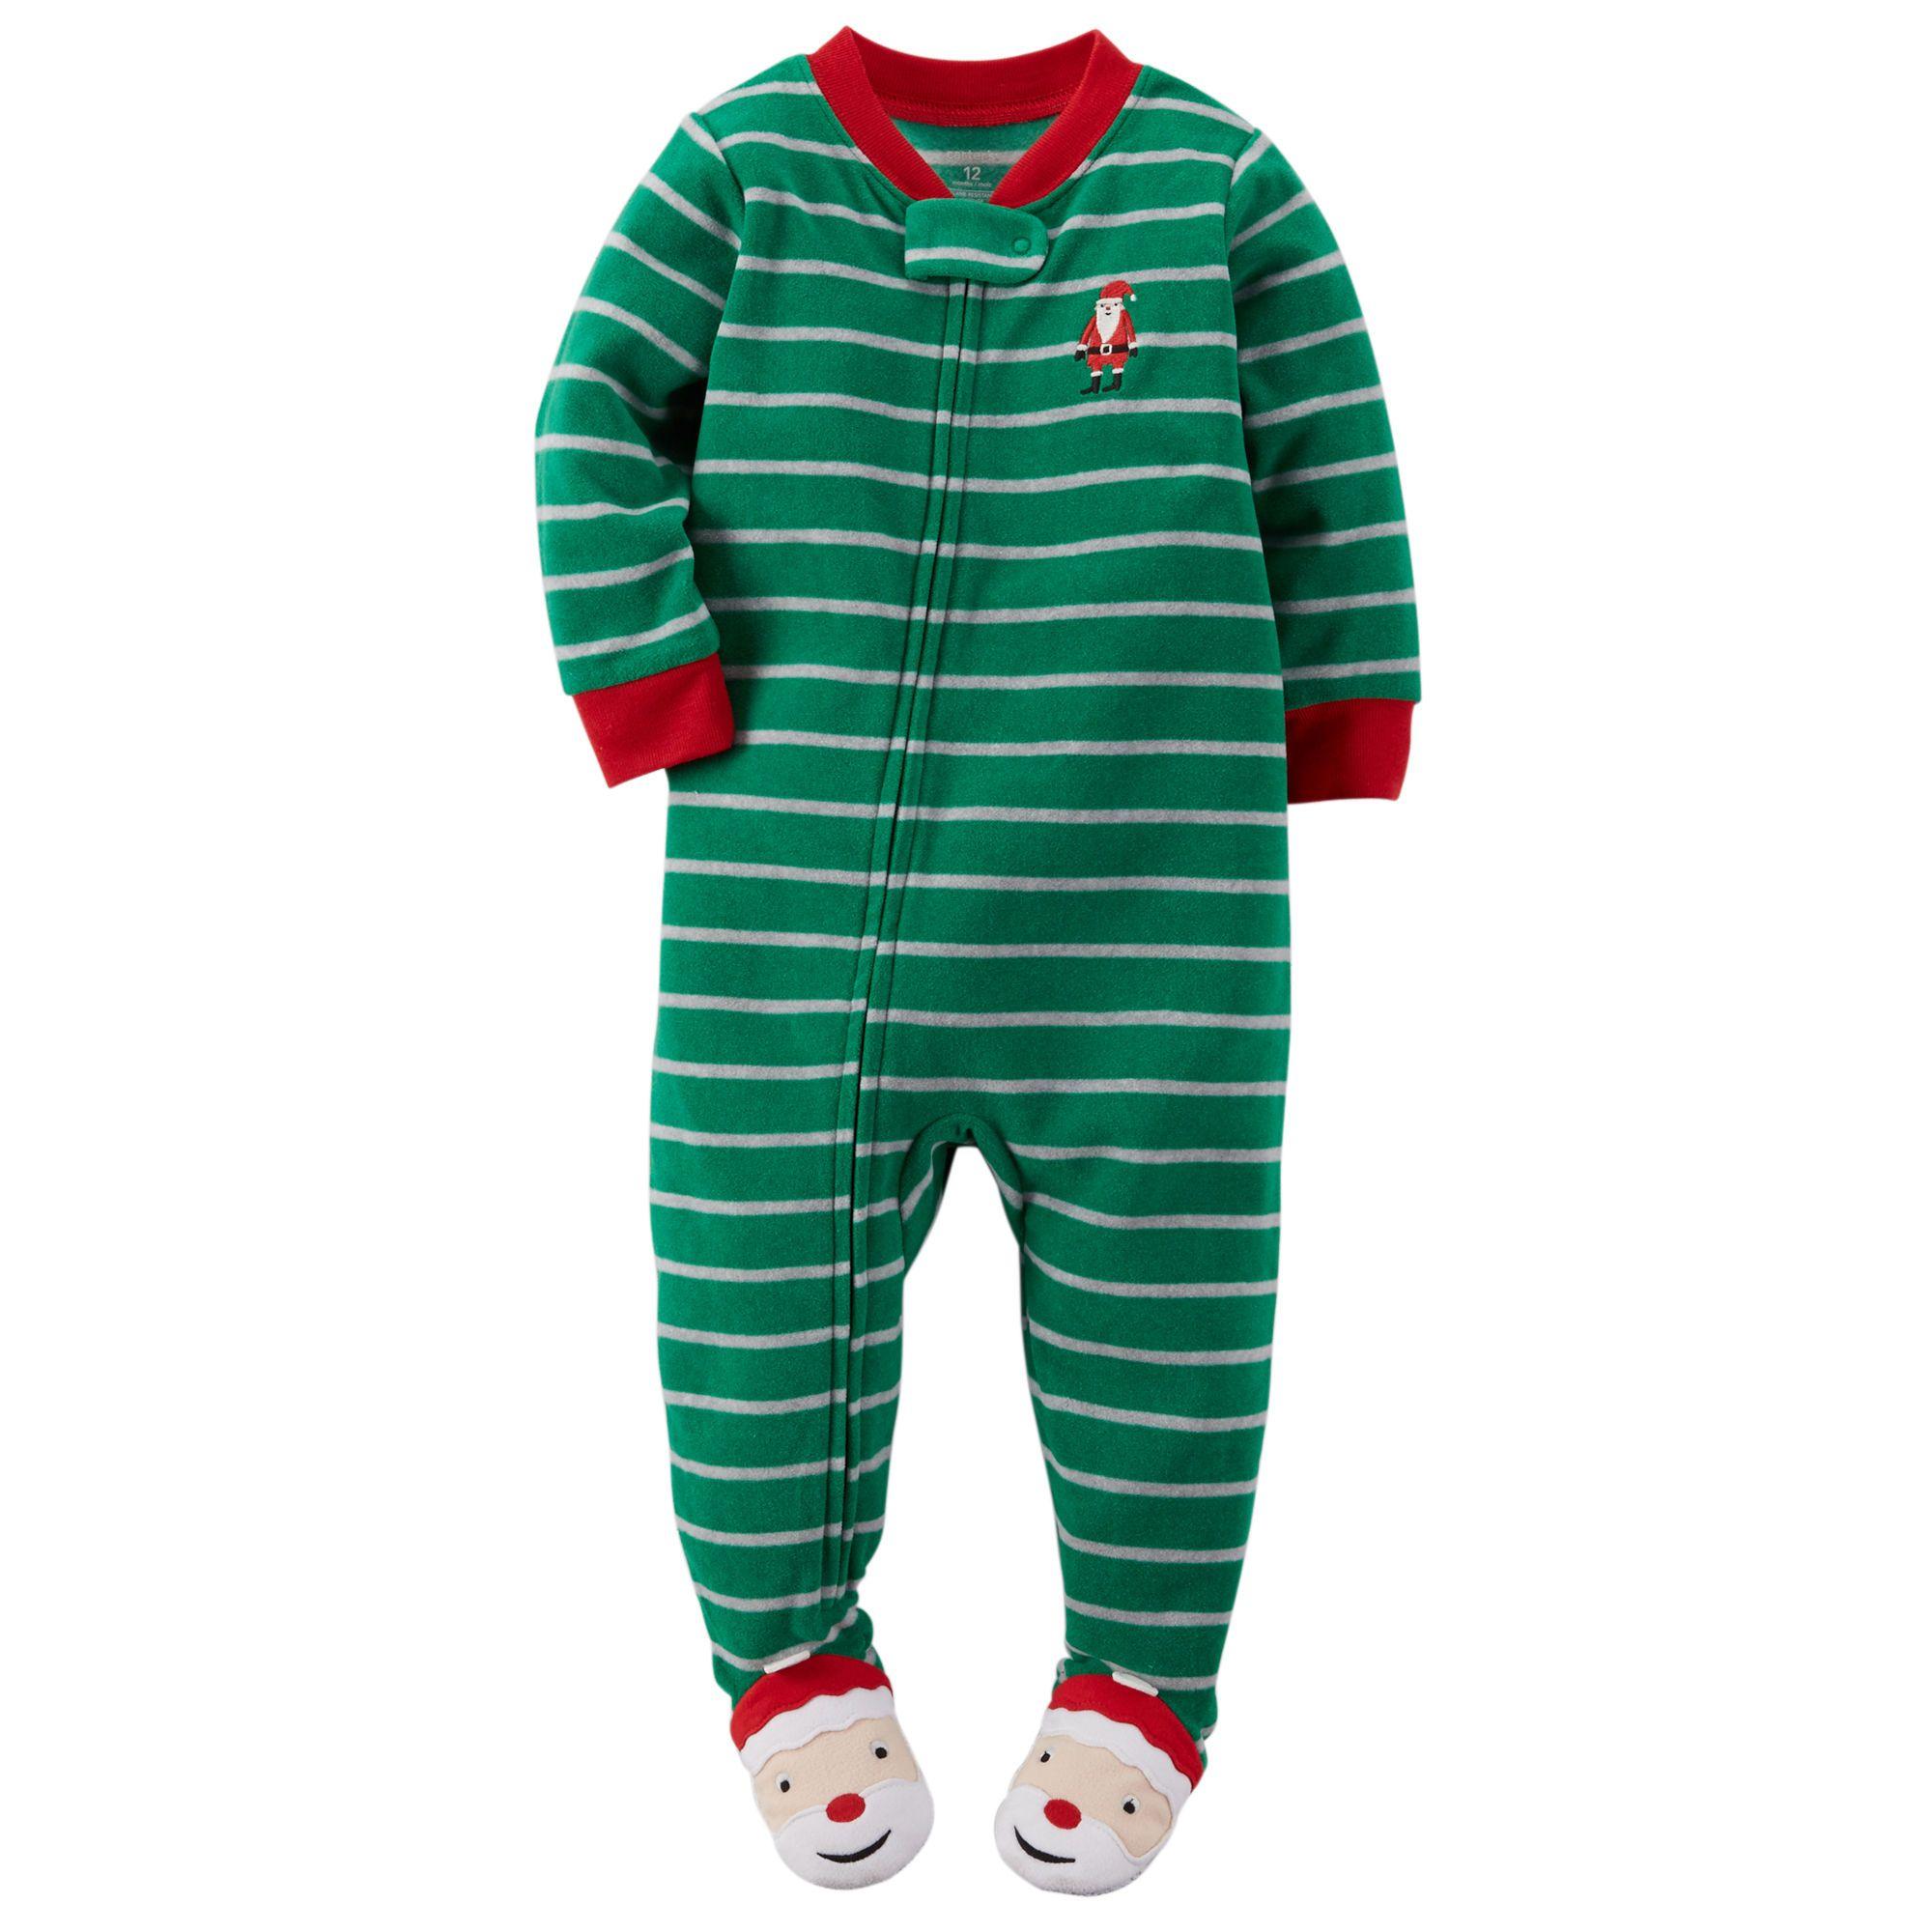 Baby Boy Pajamas Amp Sleepwear Carters Com 24 Mos Baby